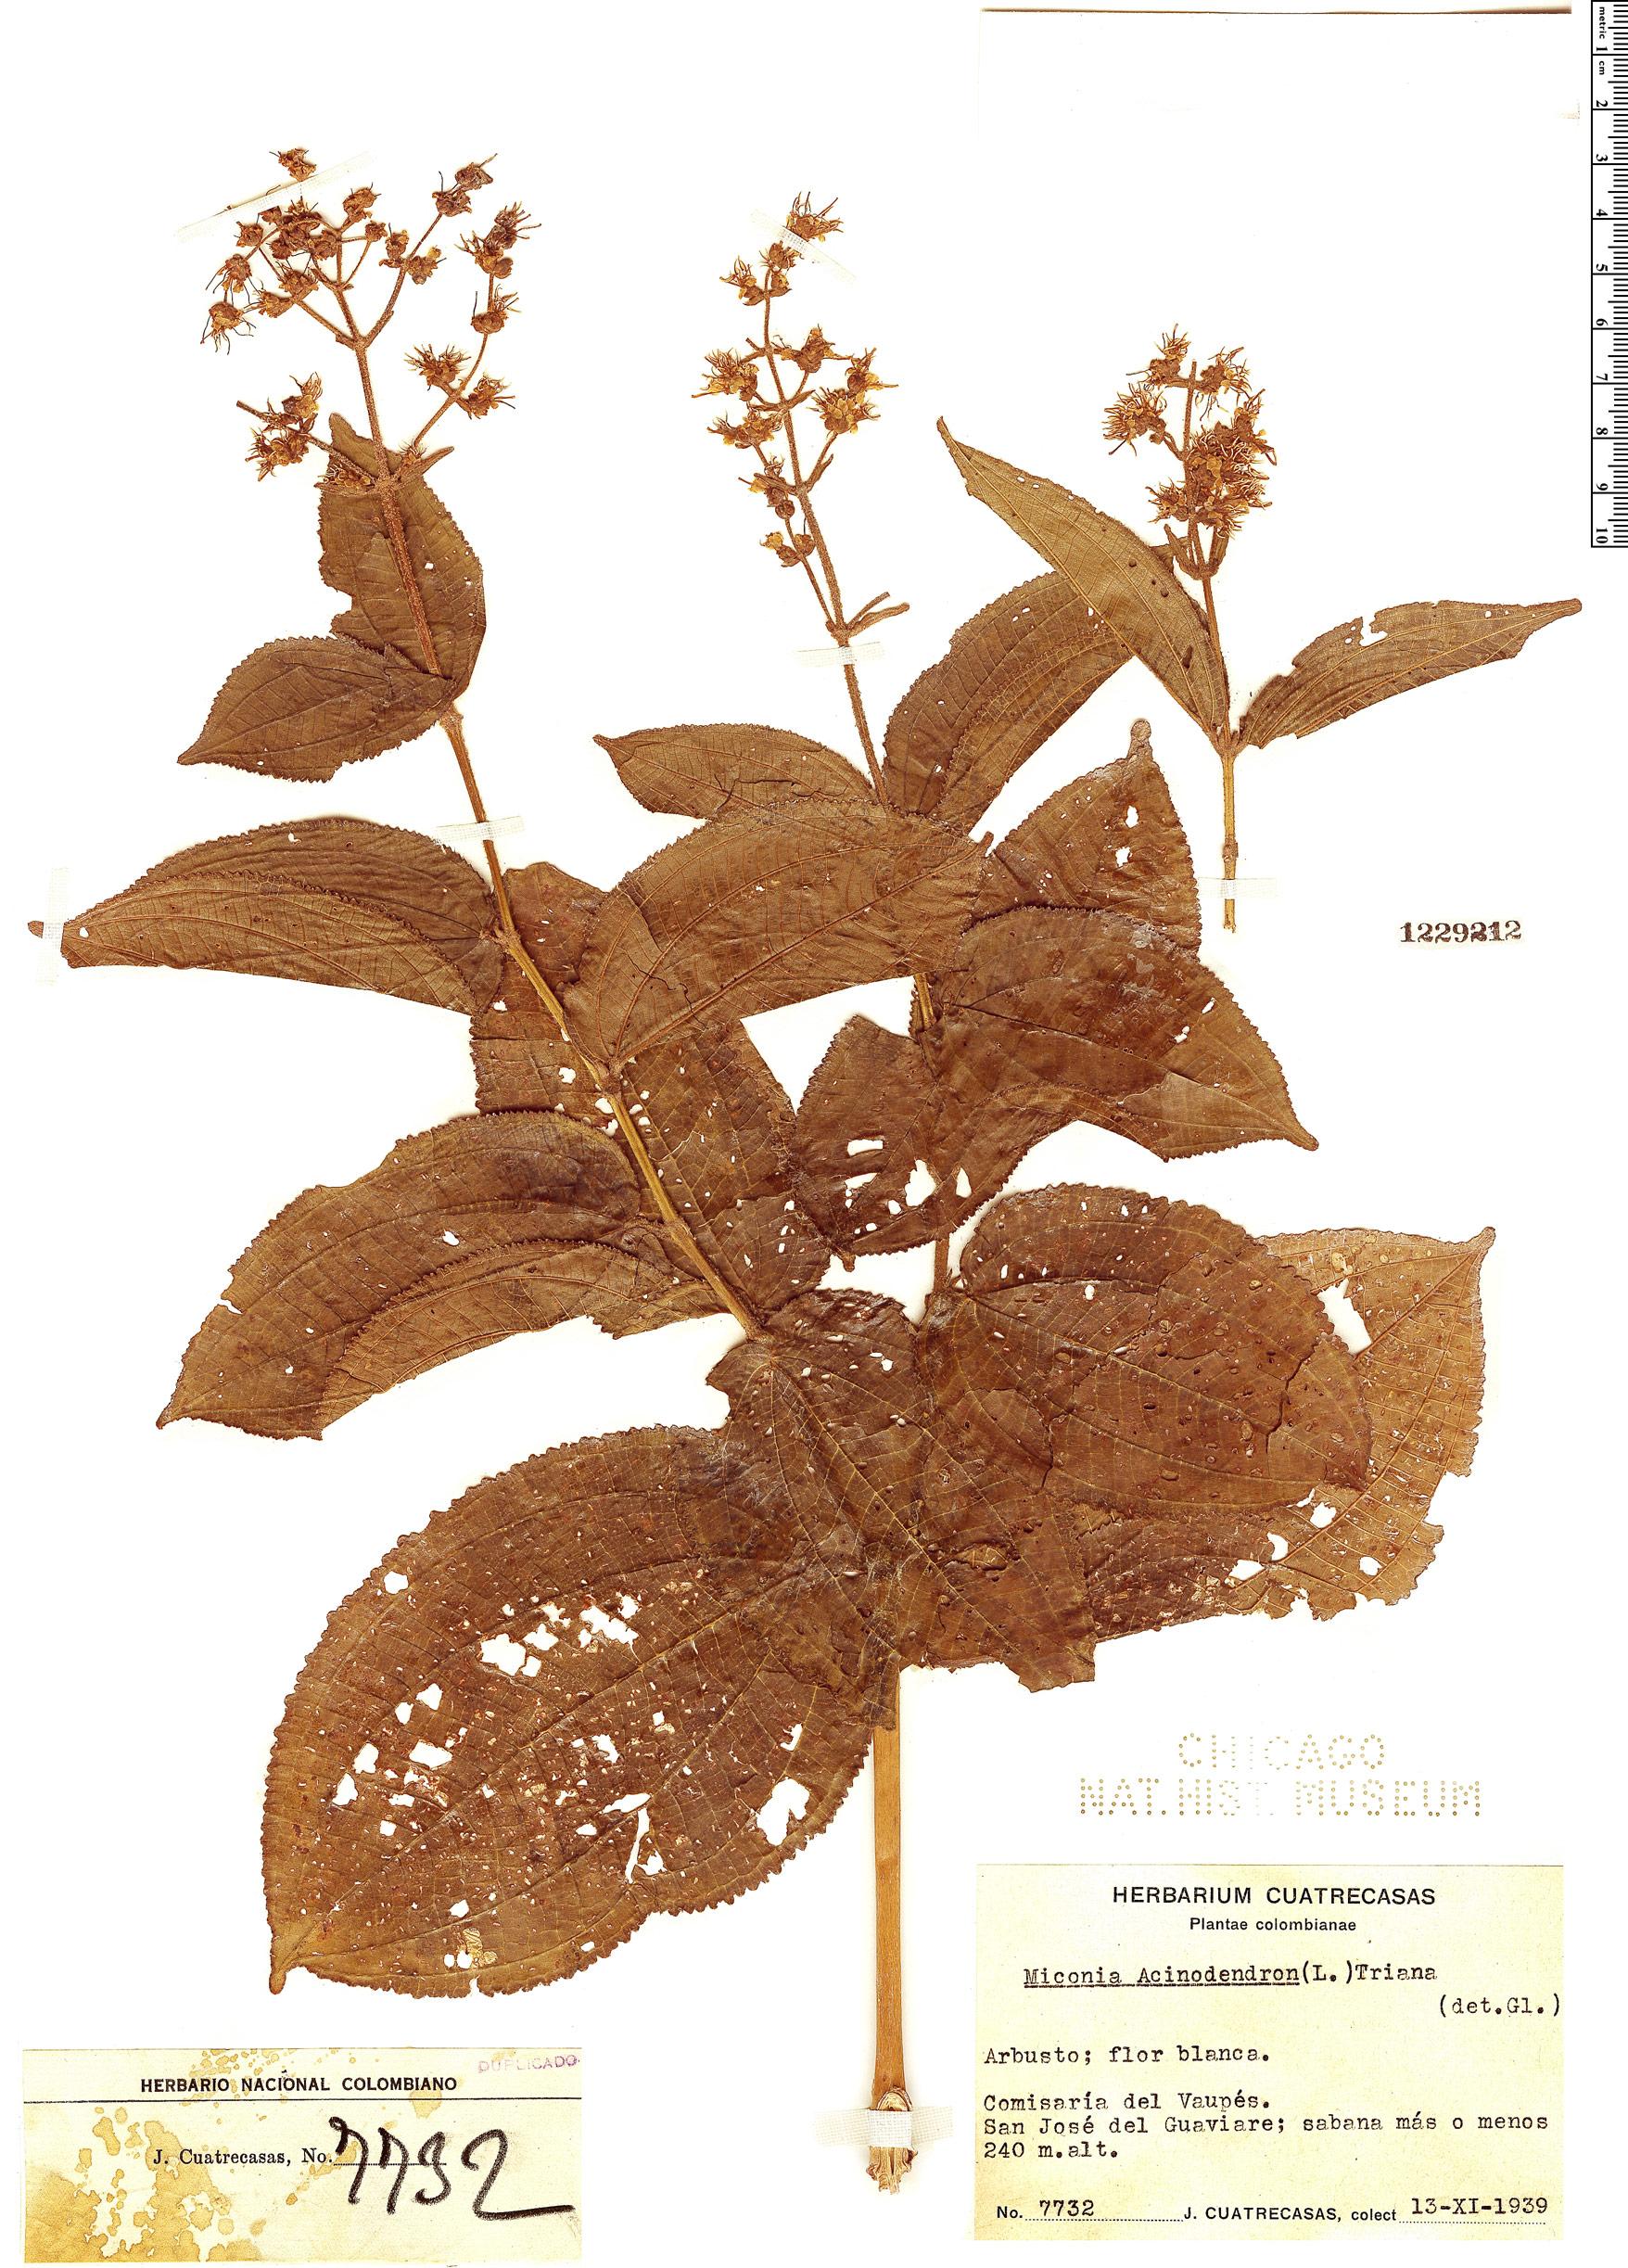 Specimen: Miconia acinodendron